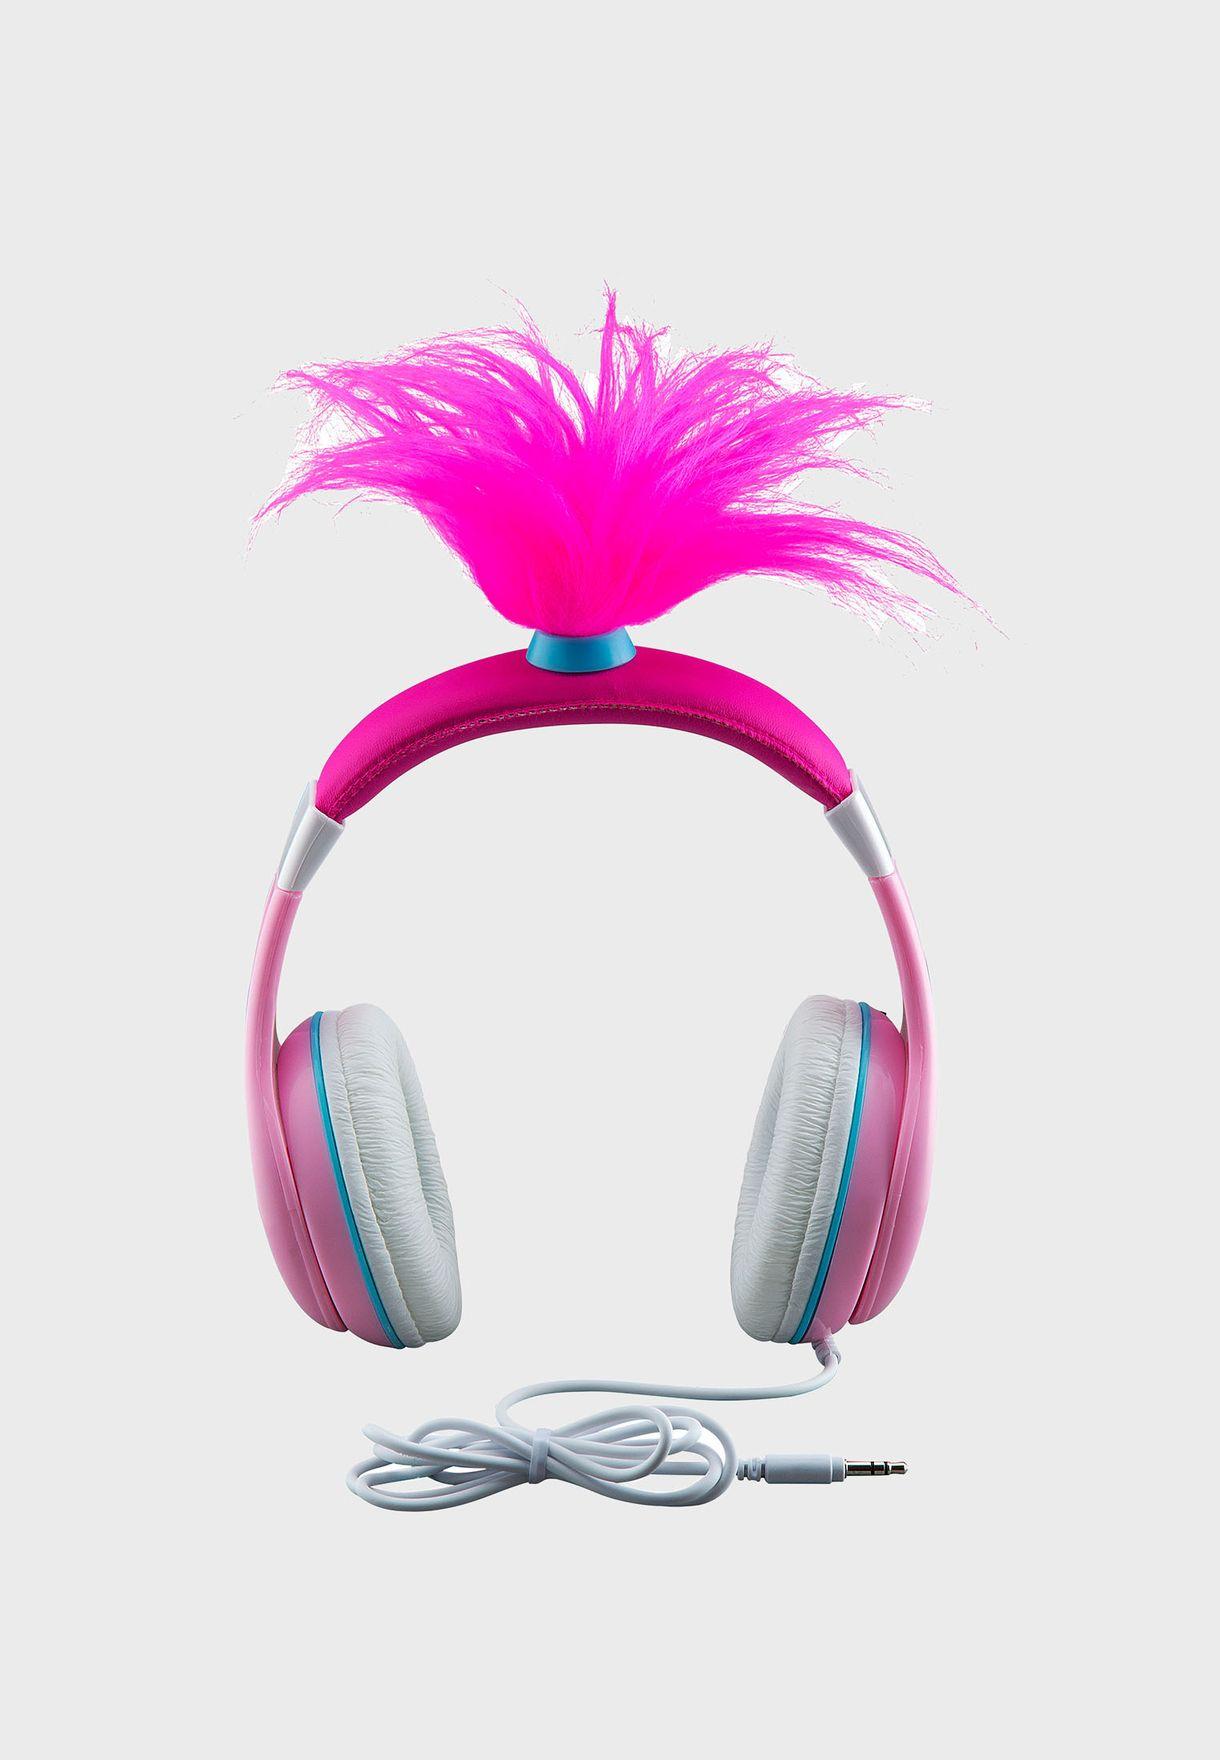 Trolls Over Ear Headphones